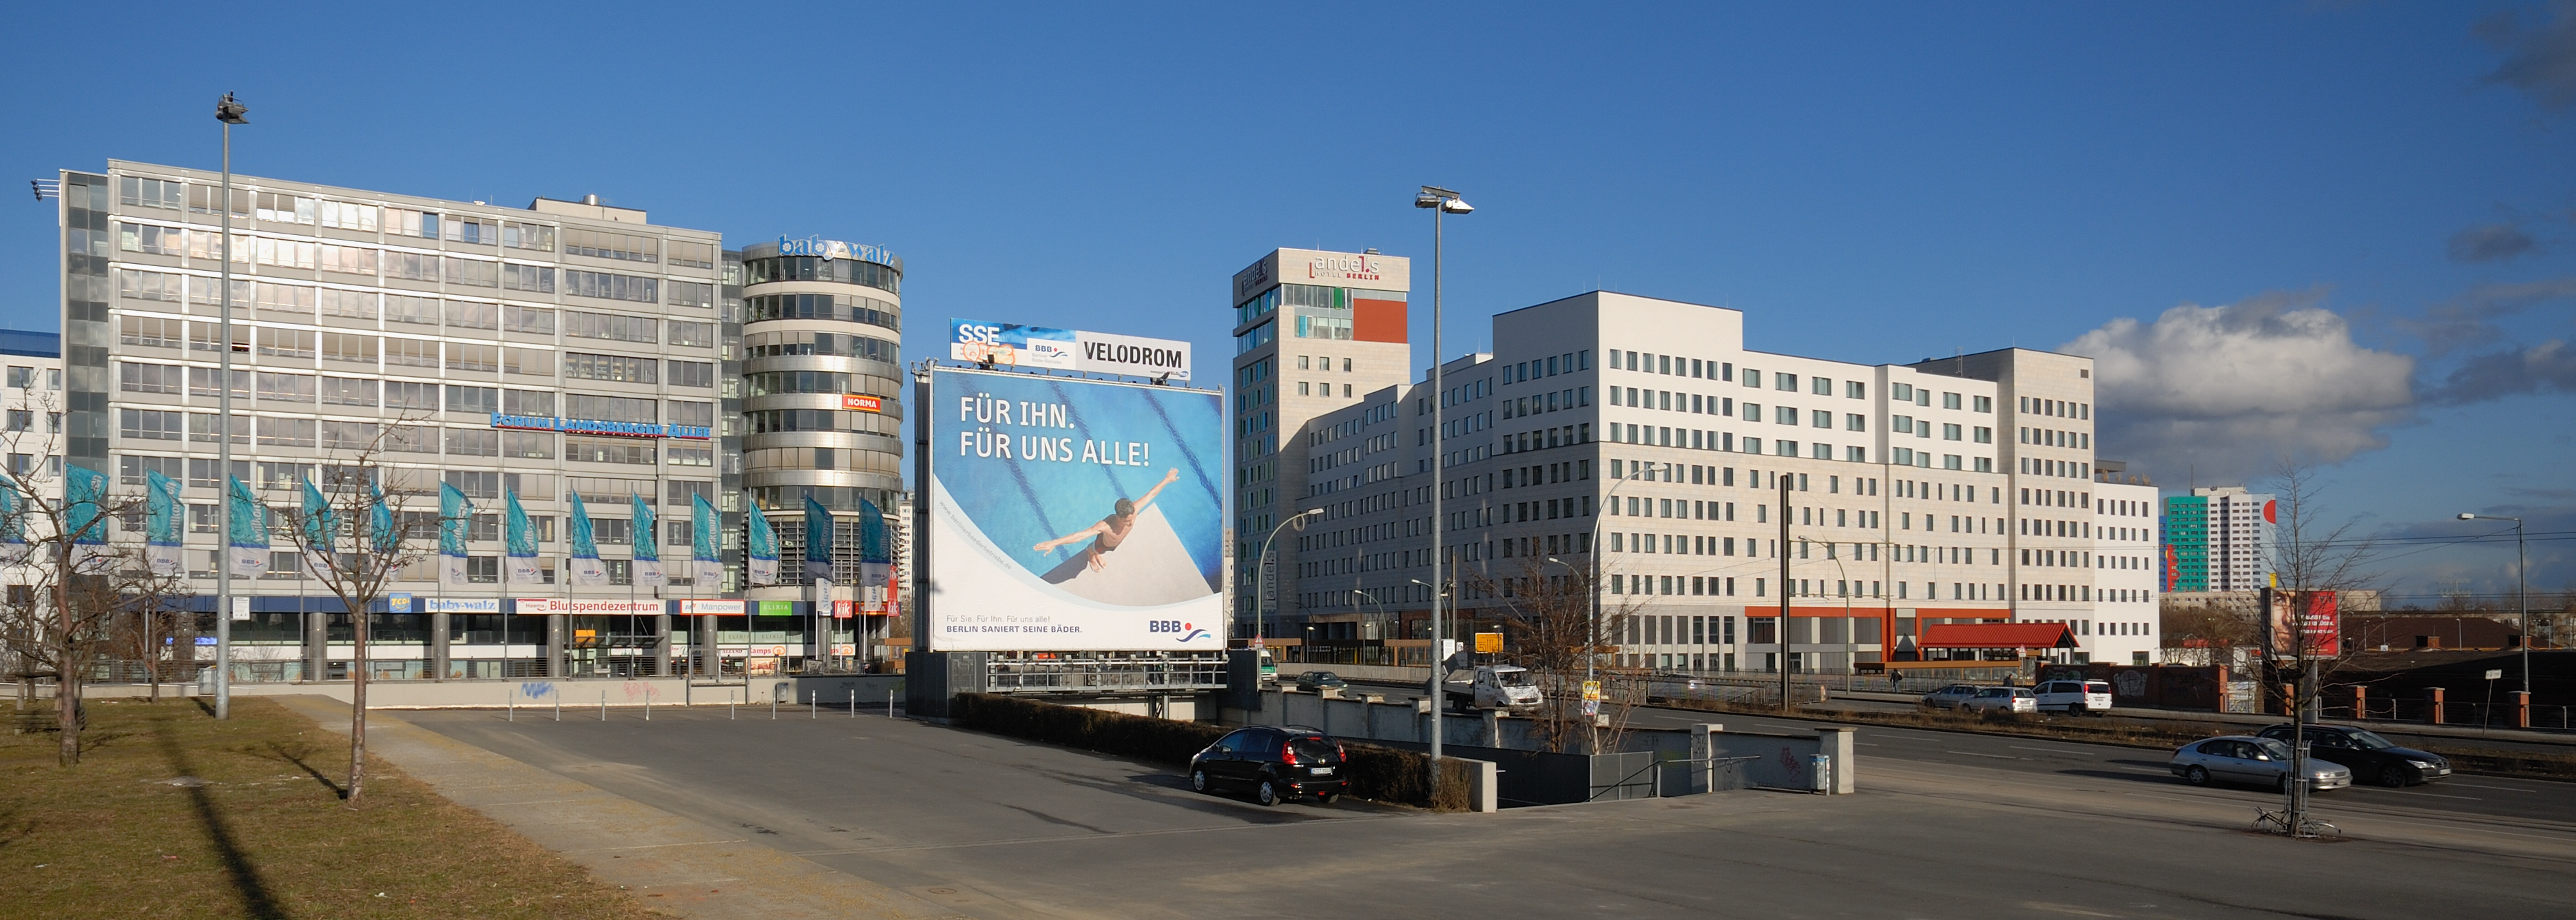 Andel Hotel Landsberger Allee  Berlin D  Germany